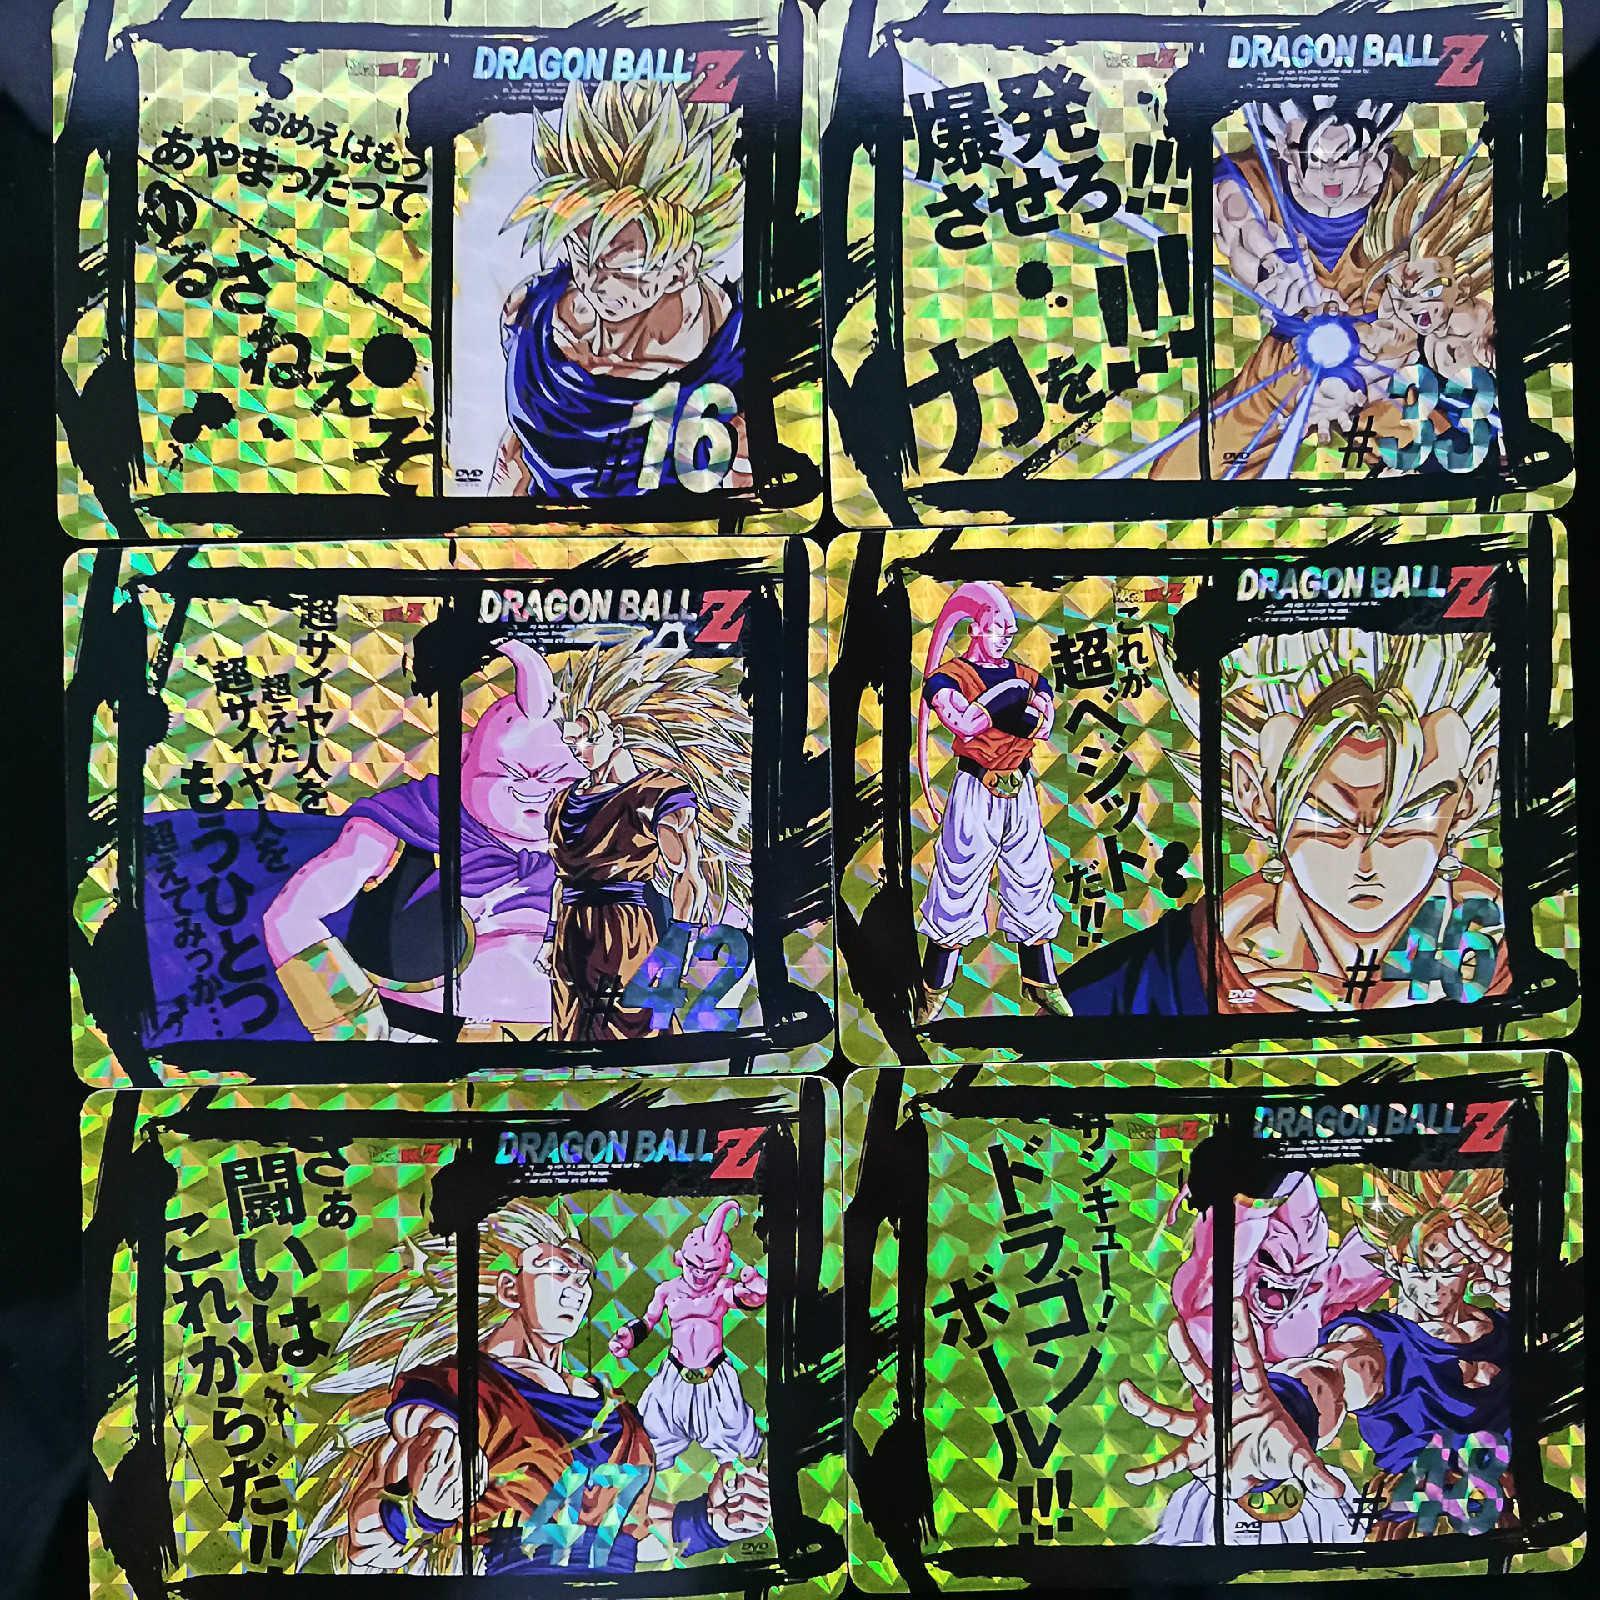 49pcs / set Dragon Ball Z CD DVD complet carte de combat Heroes édition CoverBall Goku Super Game Collection Cartes T191021